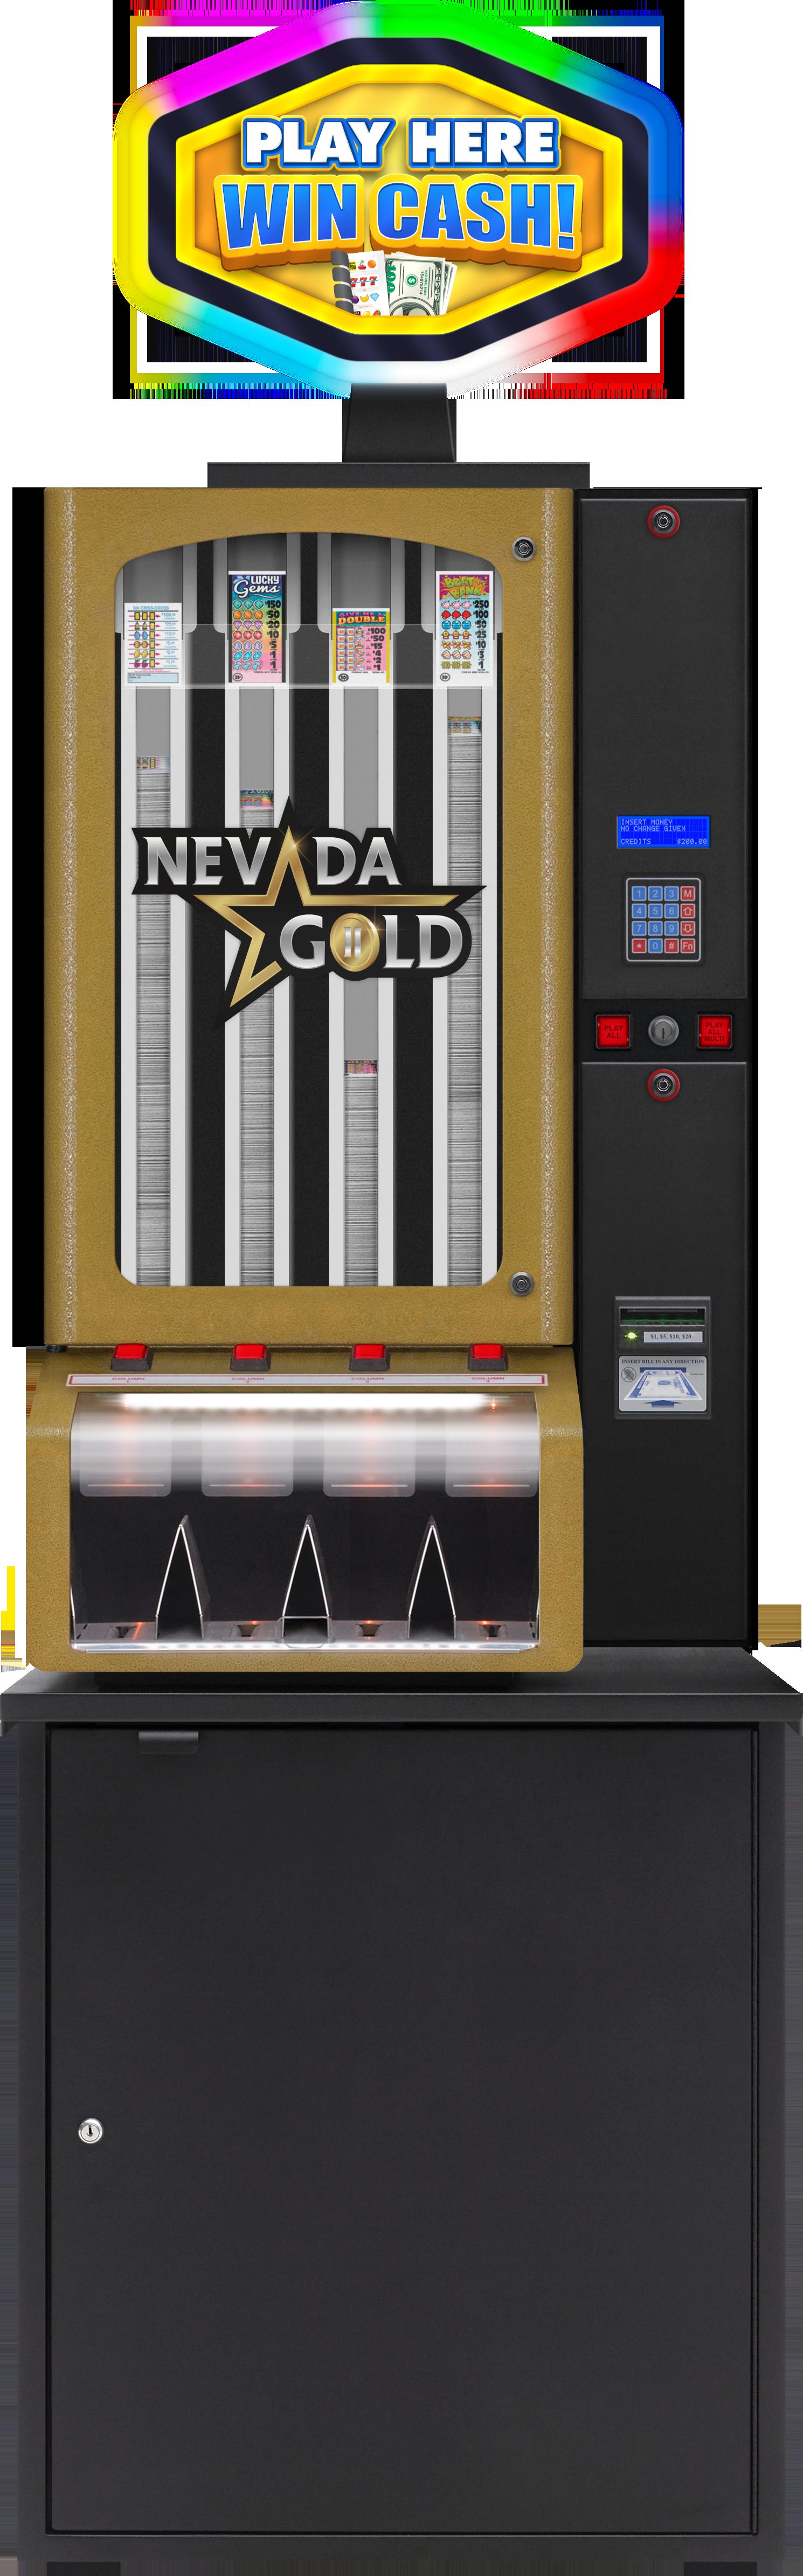 Nevada Gold II 4 col with Topper BINGO EQUIPMENT/Pull Tab Dispensers/Nevada Gold II